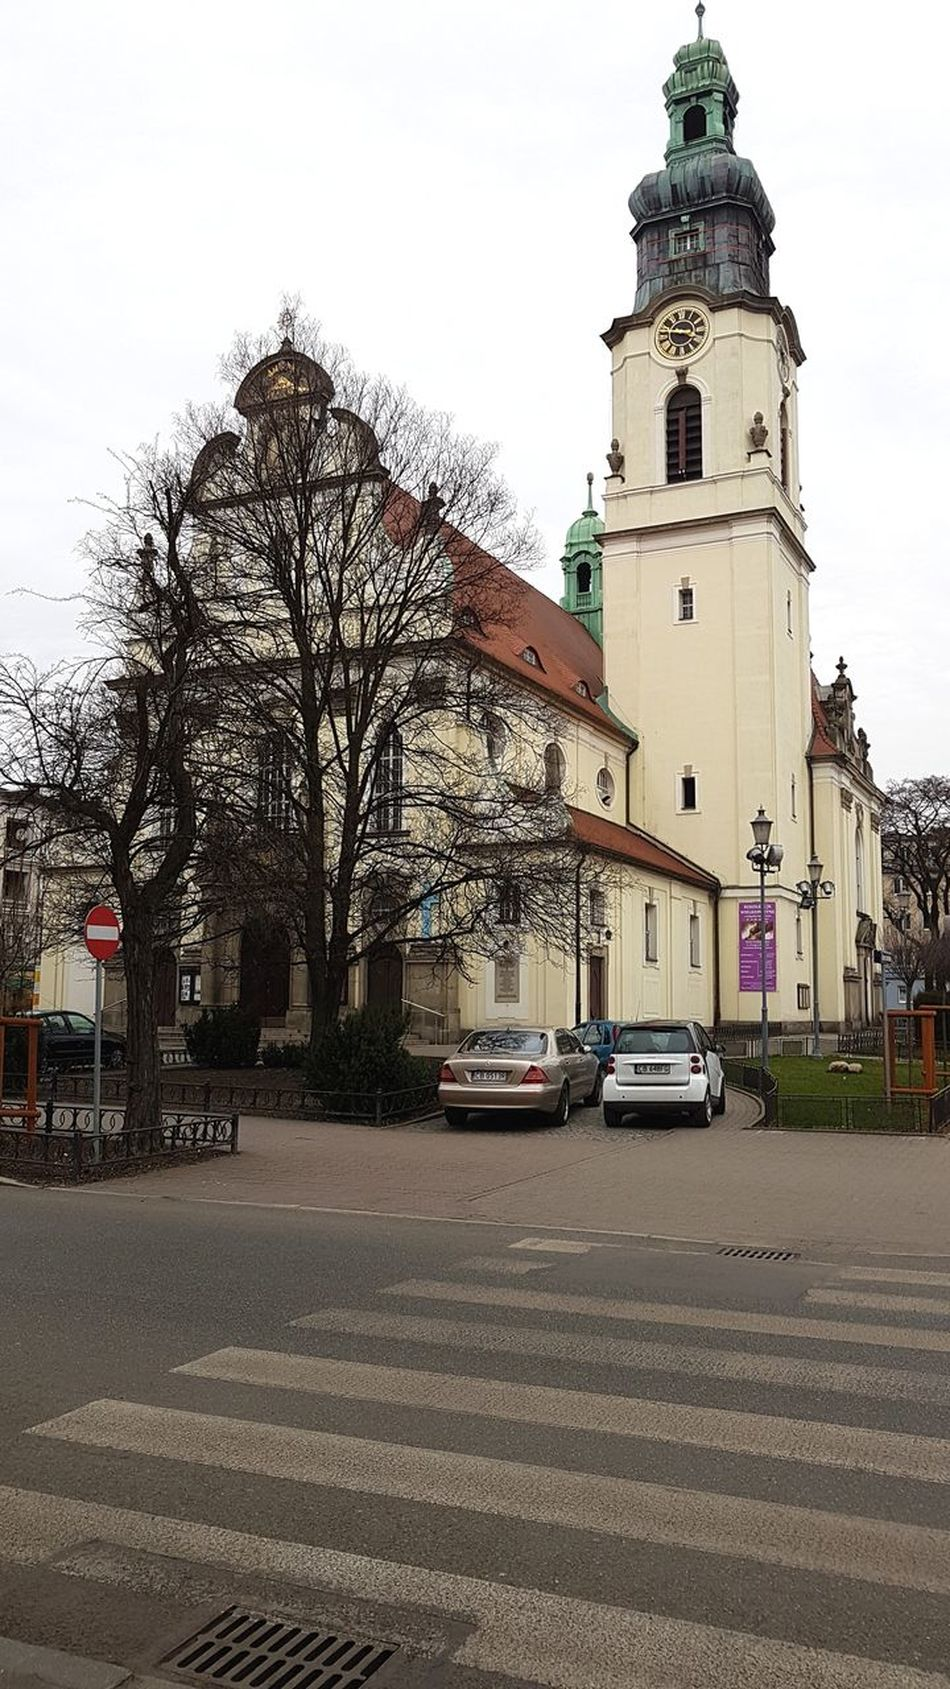 Poland Bydgoszcz Church Building Exterior Tower Outdoors Architecture Day Sky Built Structure Religion Polandarchitecture Street Clock